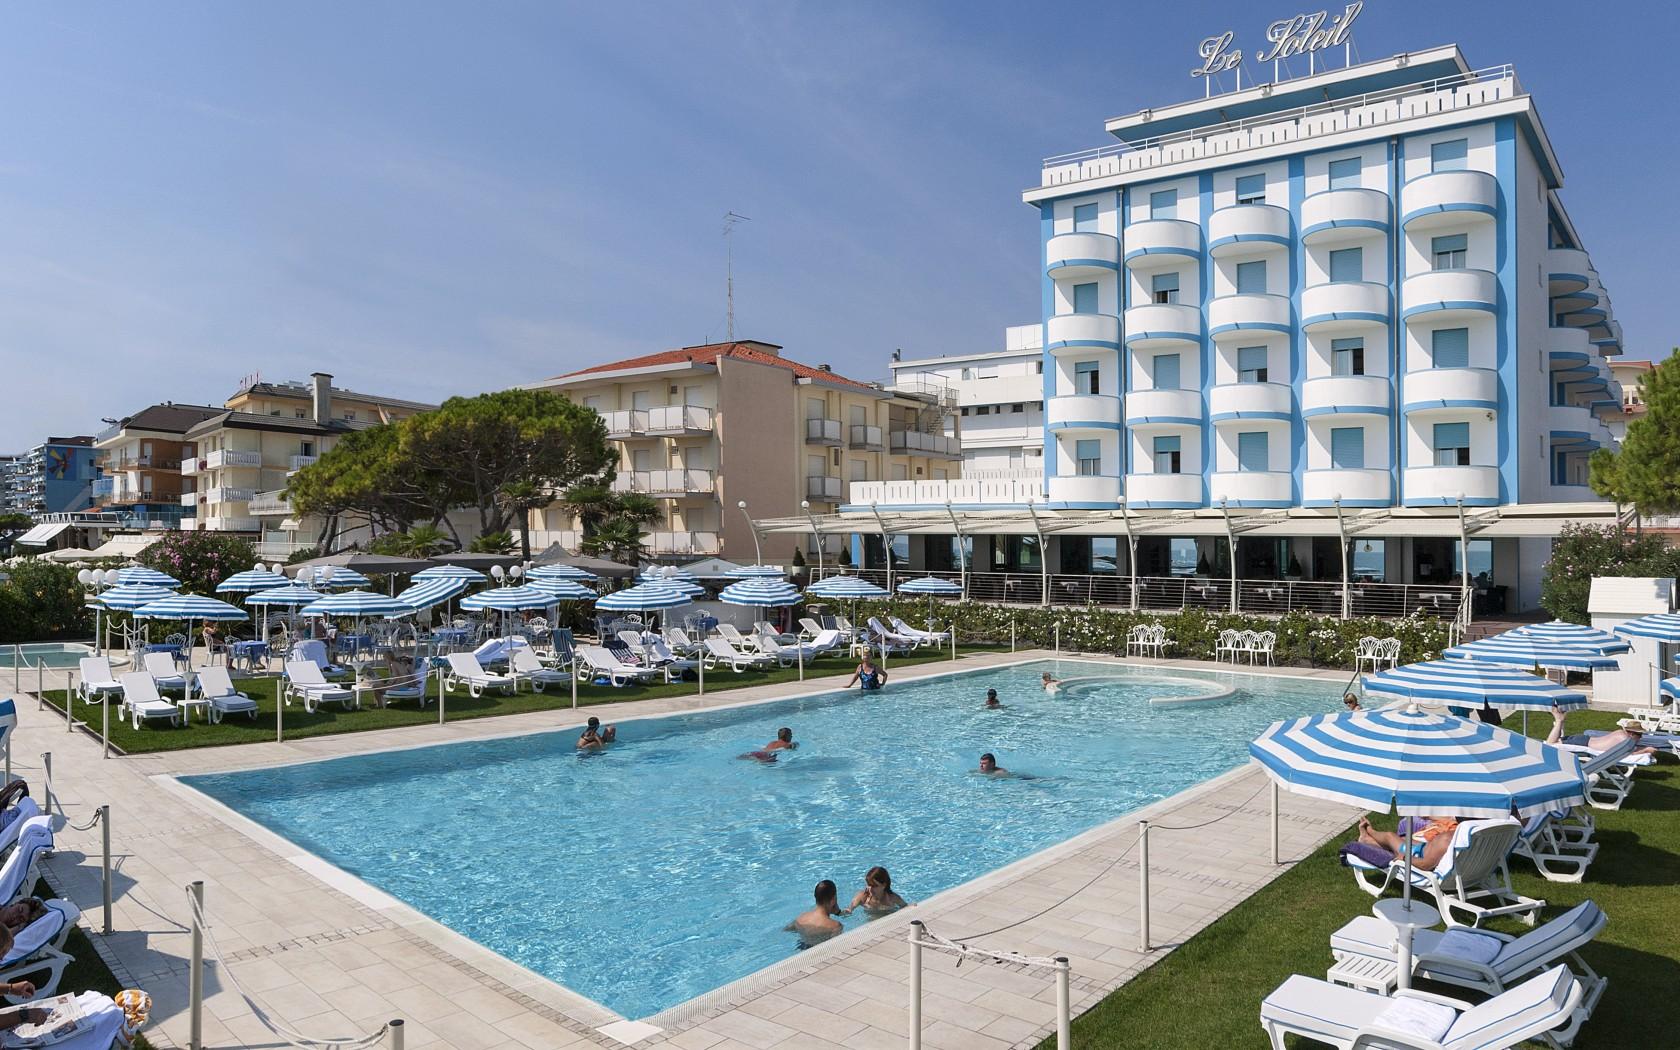 Hotel Le Soleil ★★★★